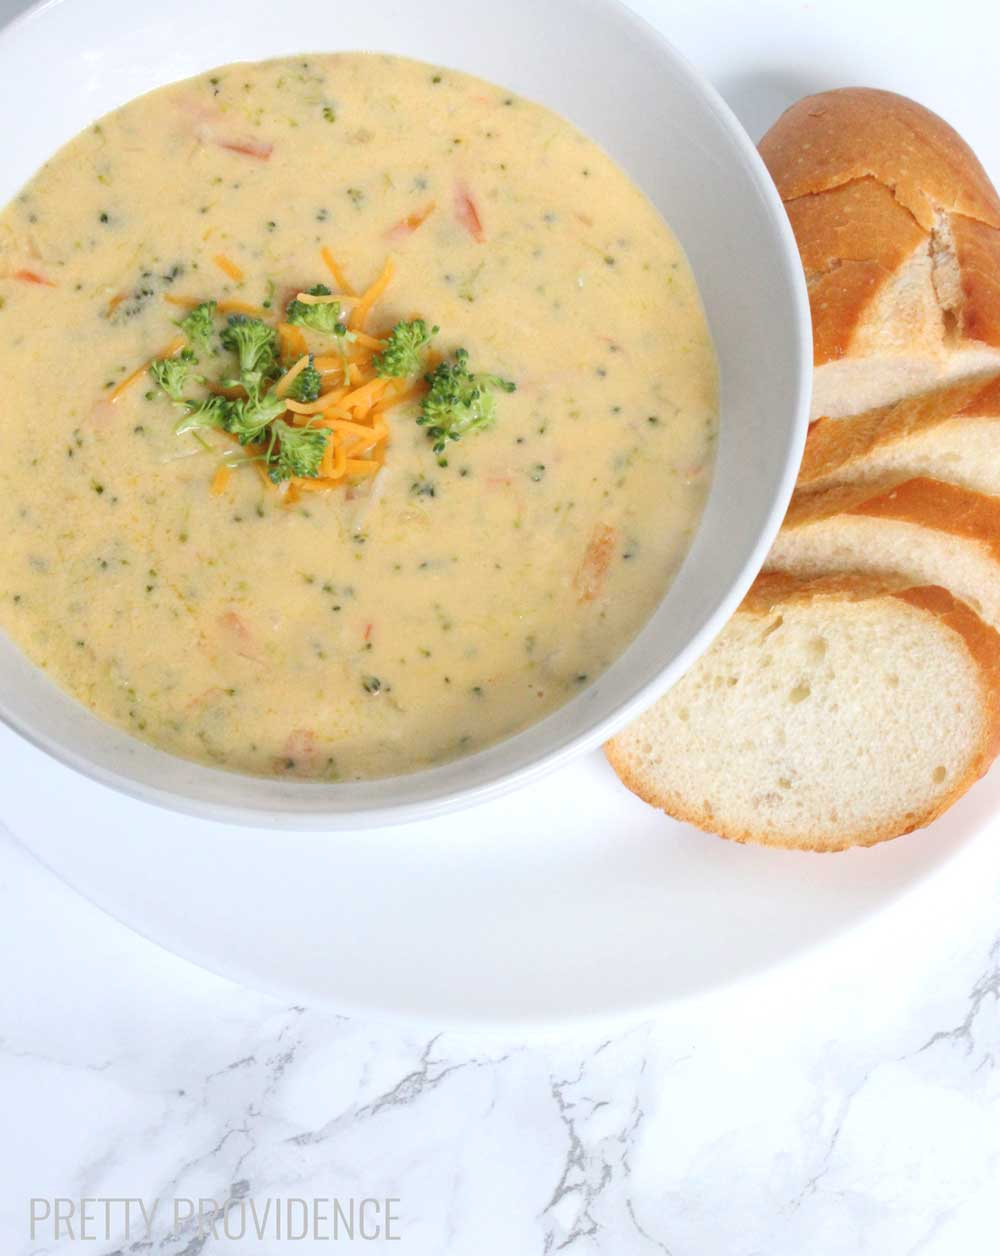 panera-broccoli-cheddar-soup-2